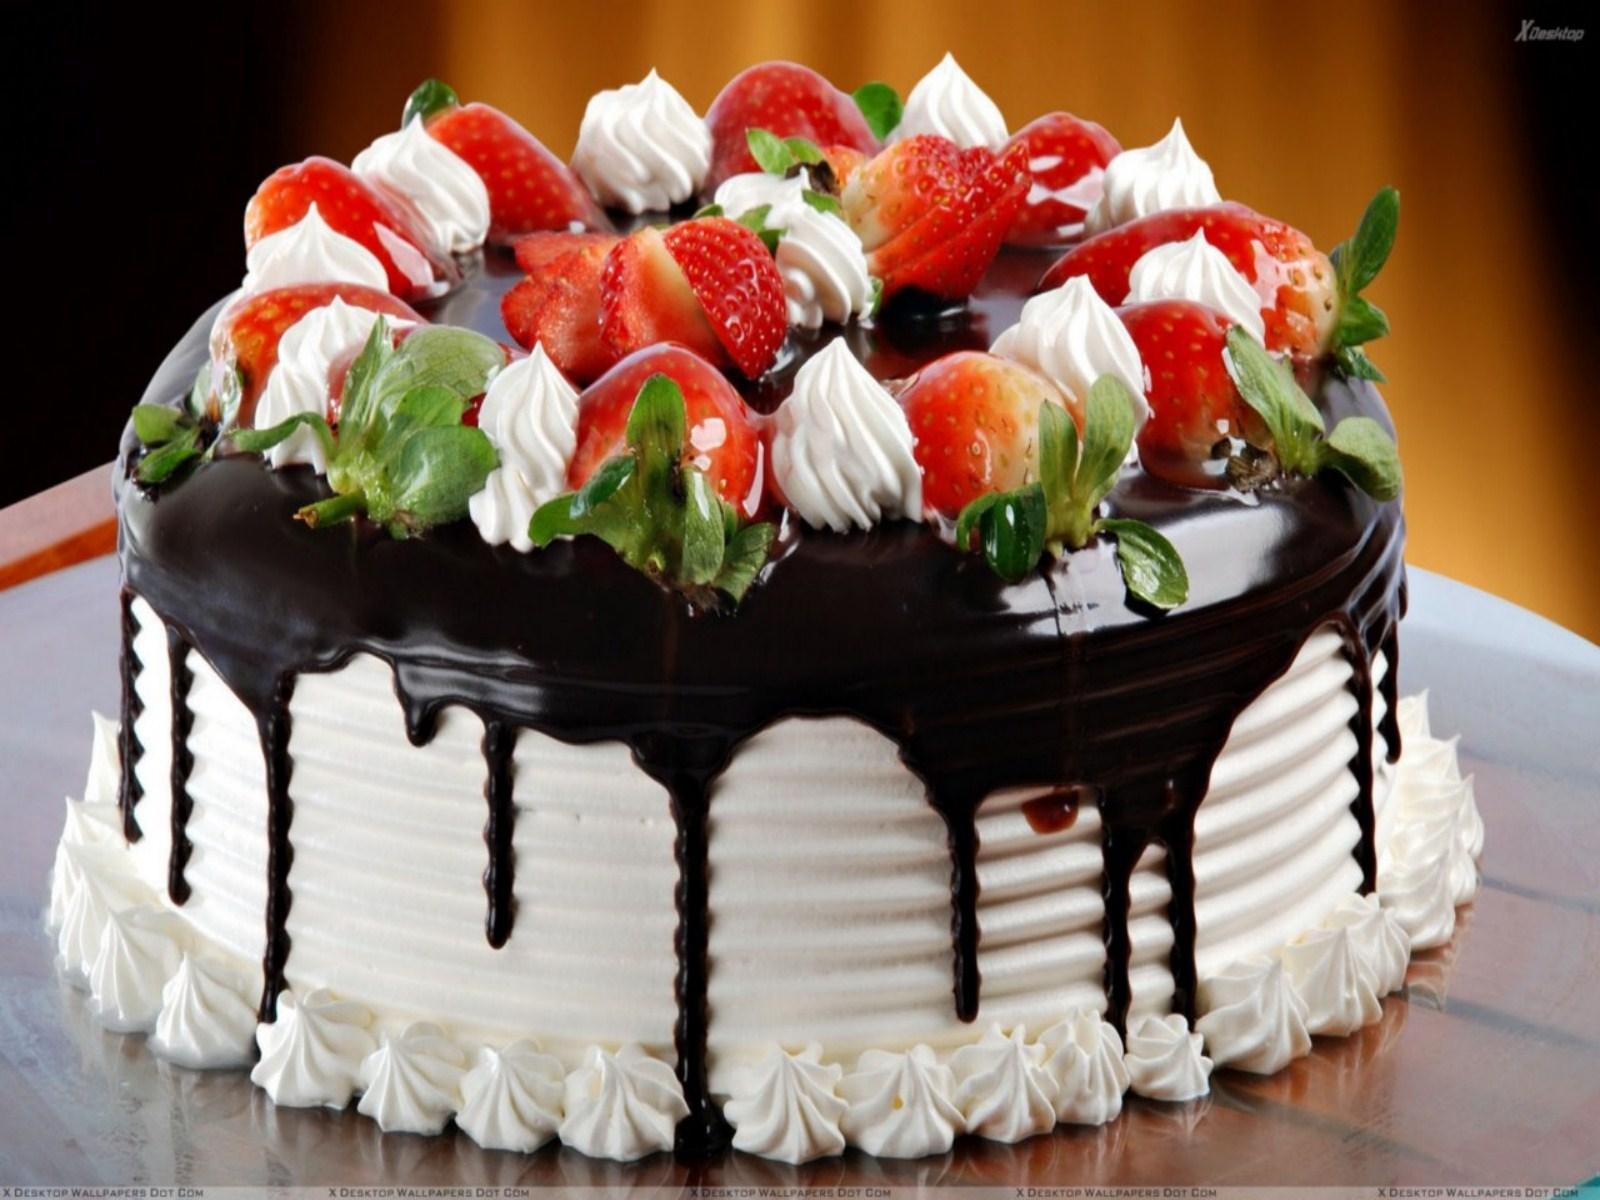 Image Chocolate birth day cakejpg Fanon Wiki FANDOM powered